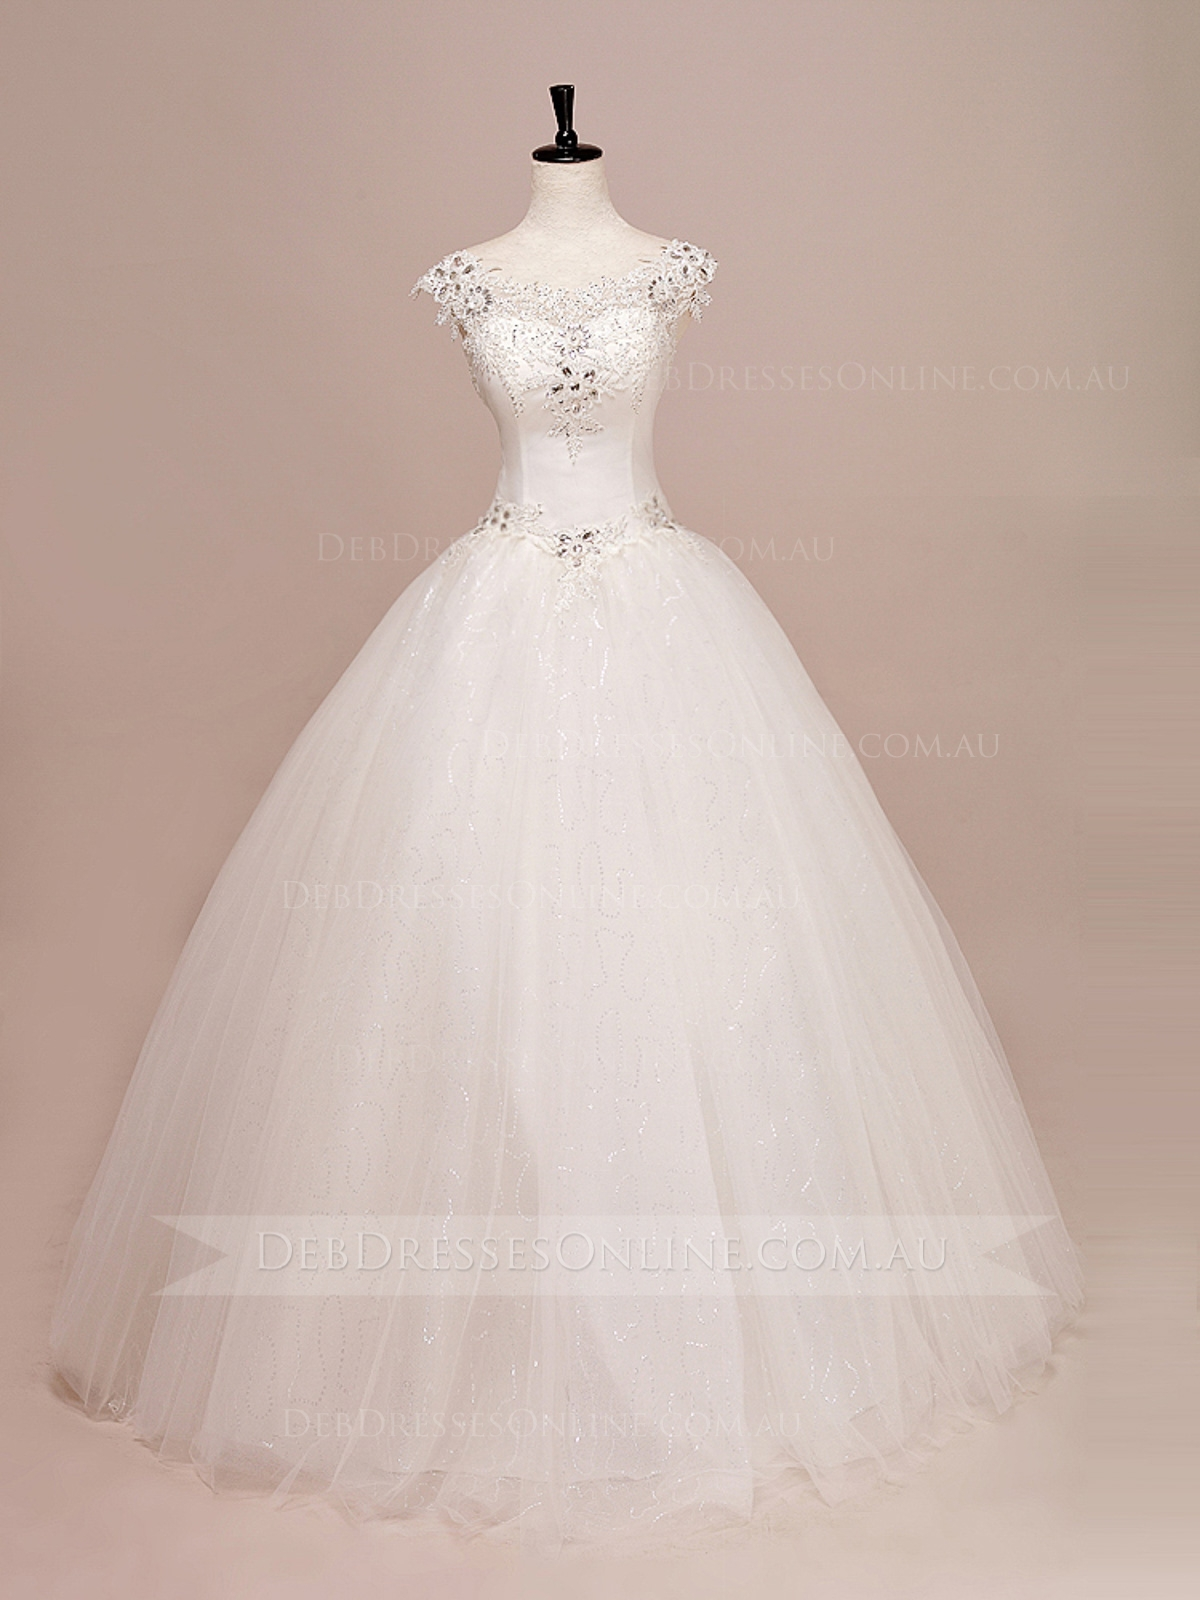 بالصور صور ملابس اعراس , اجمل فساتين الافراح 4951 7